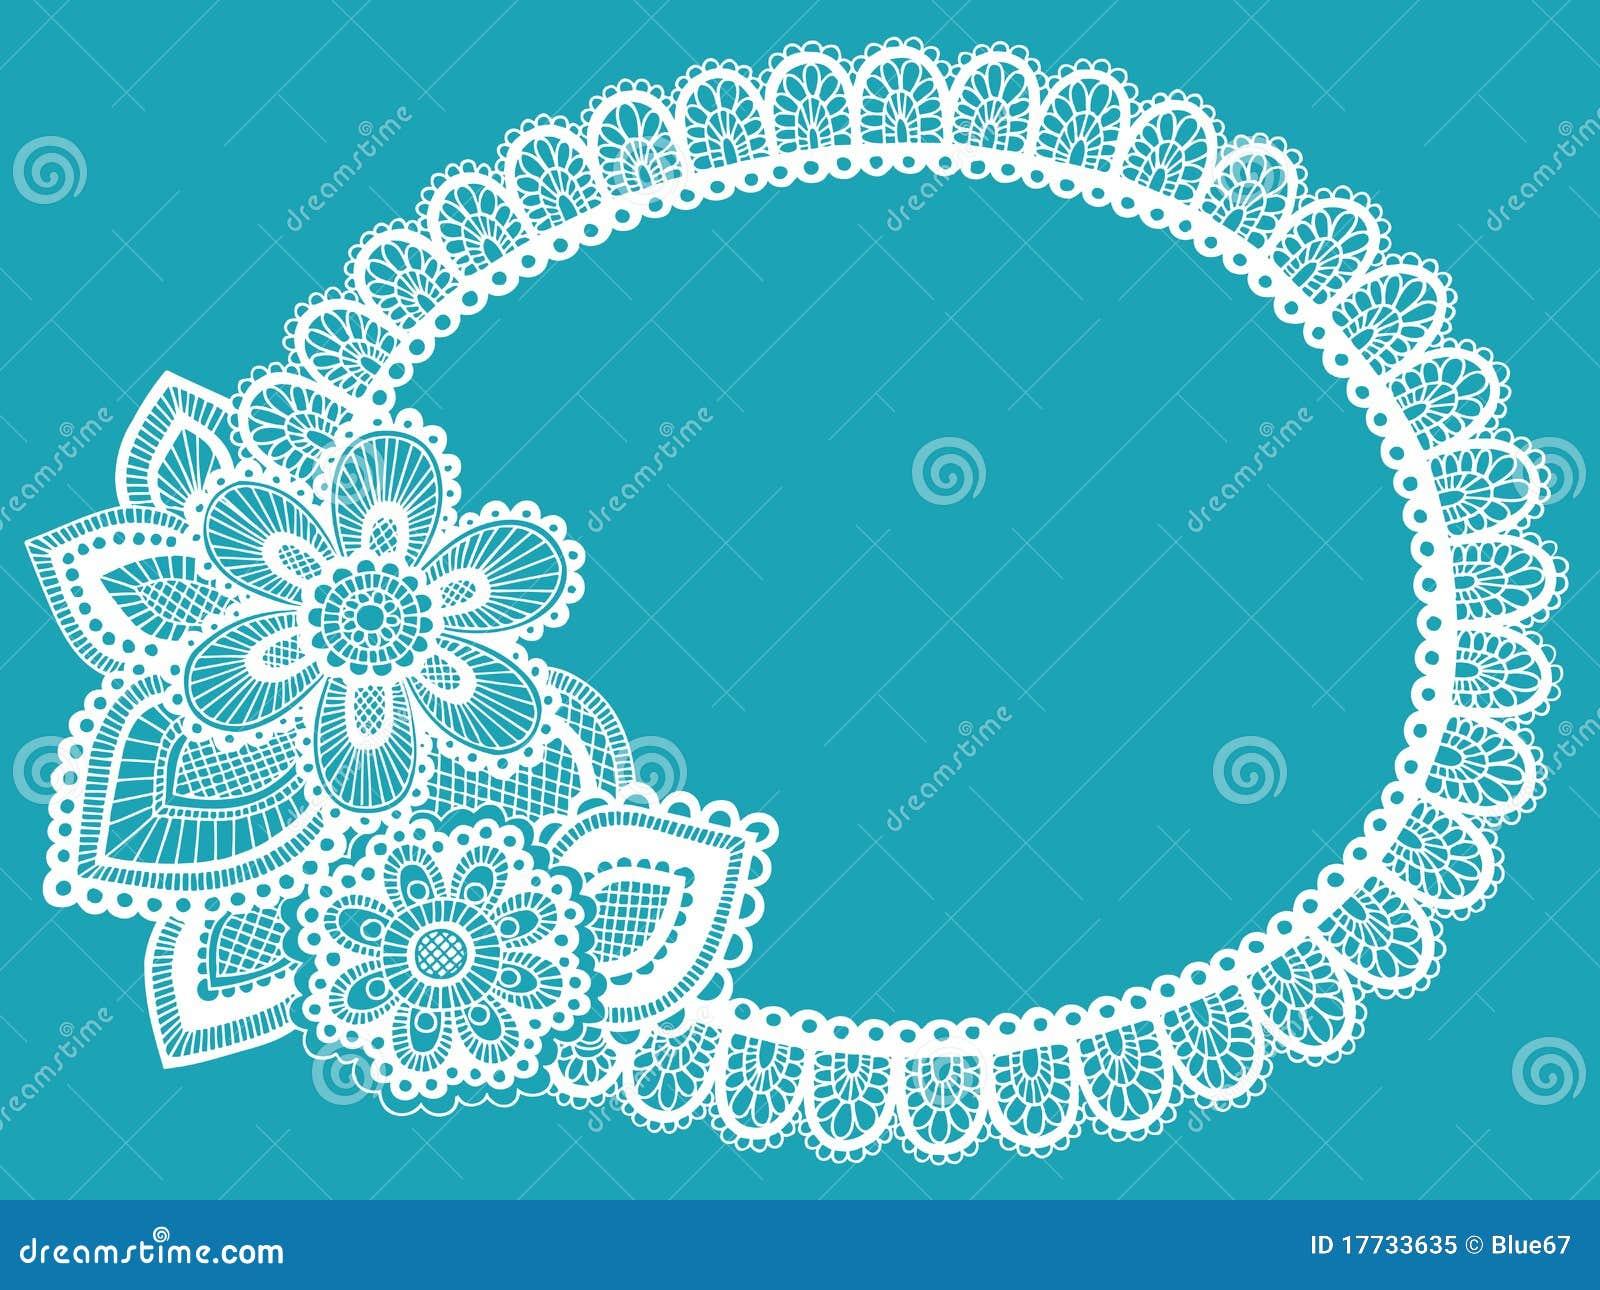 Lace Doily Henna Flower Vector Illustration Design